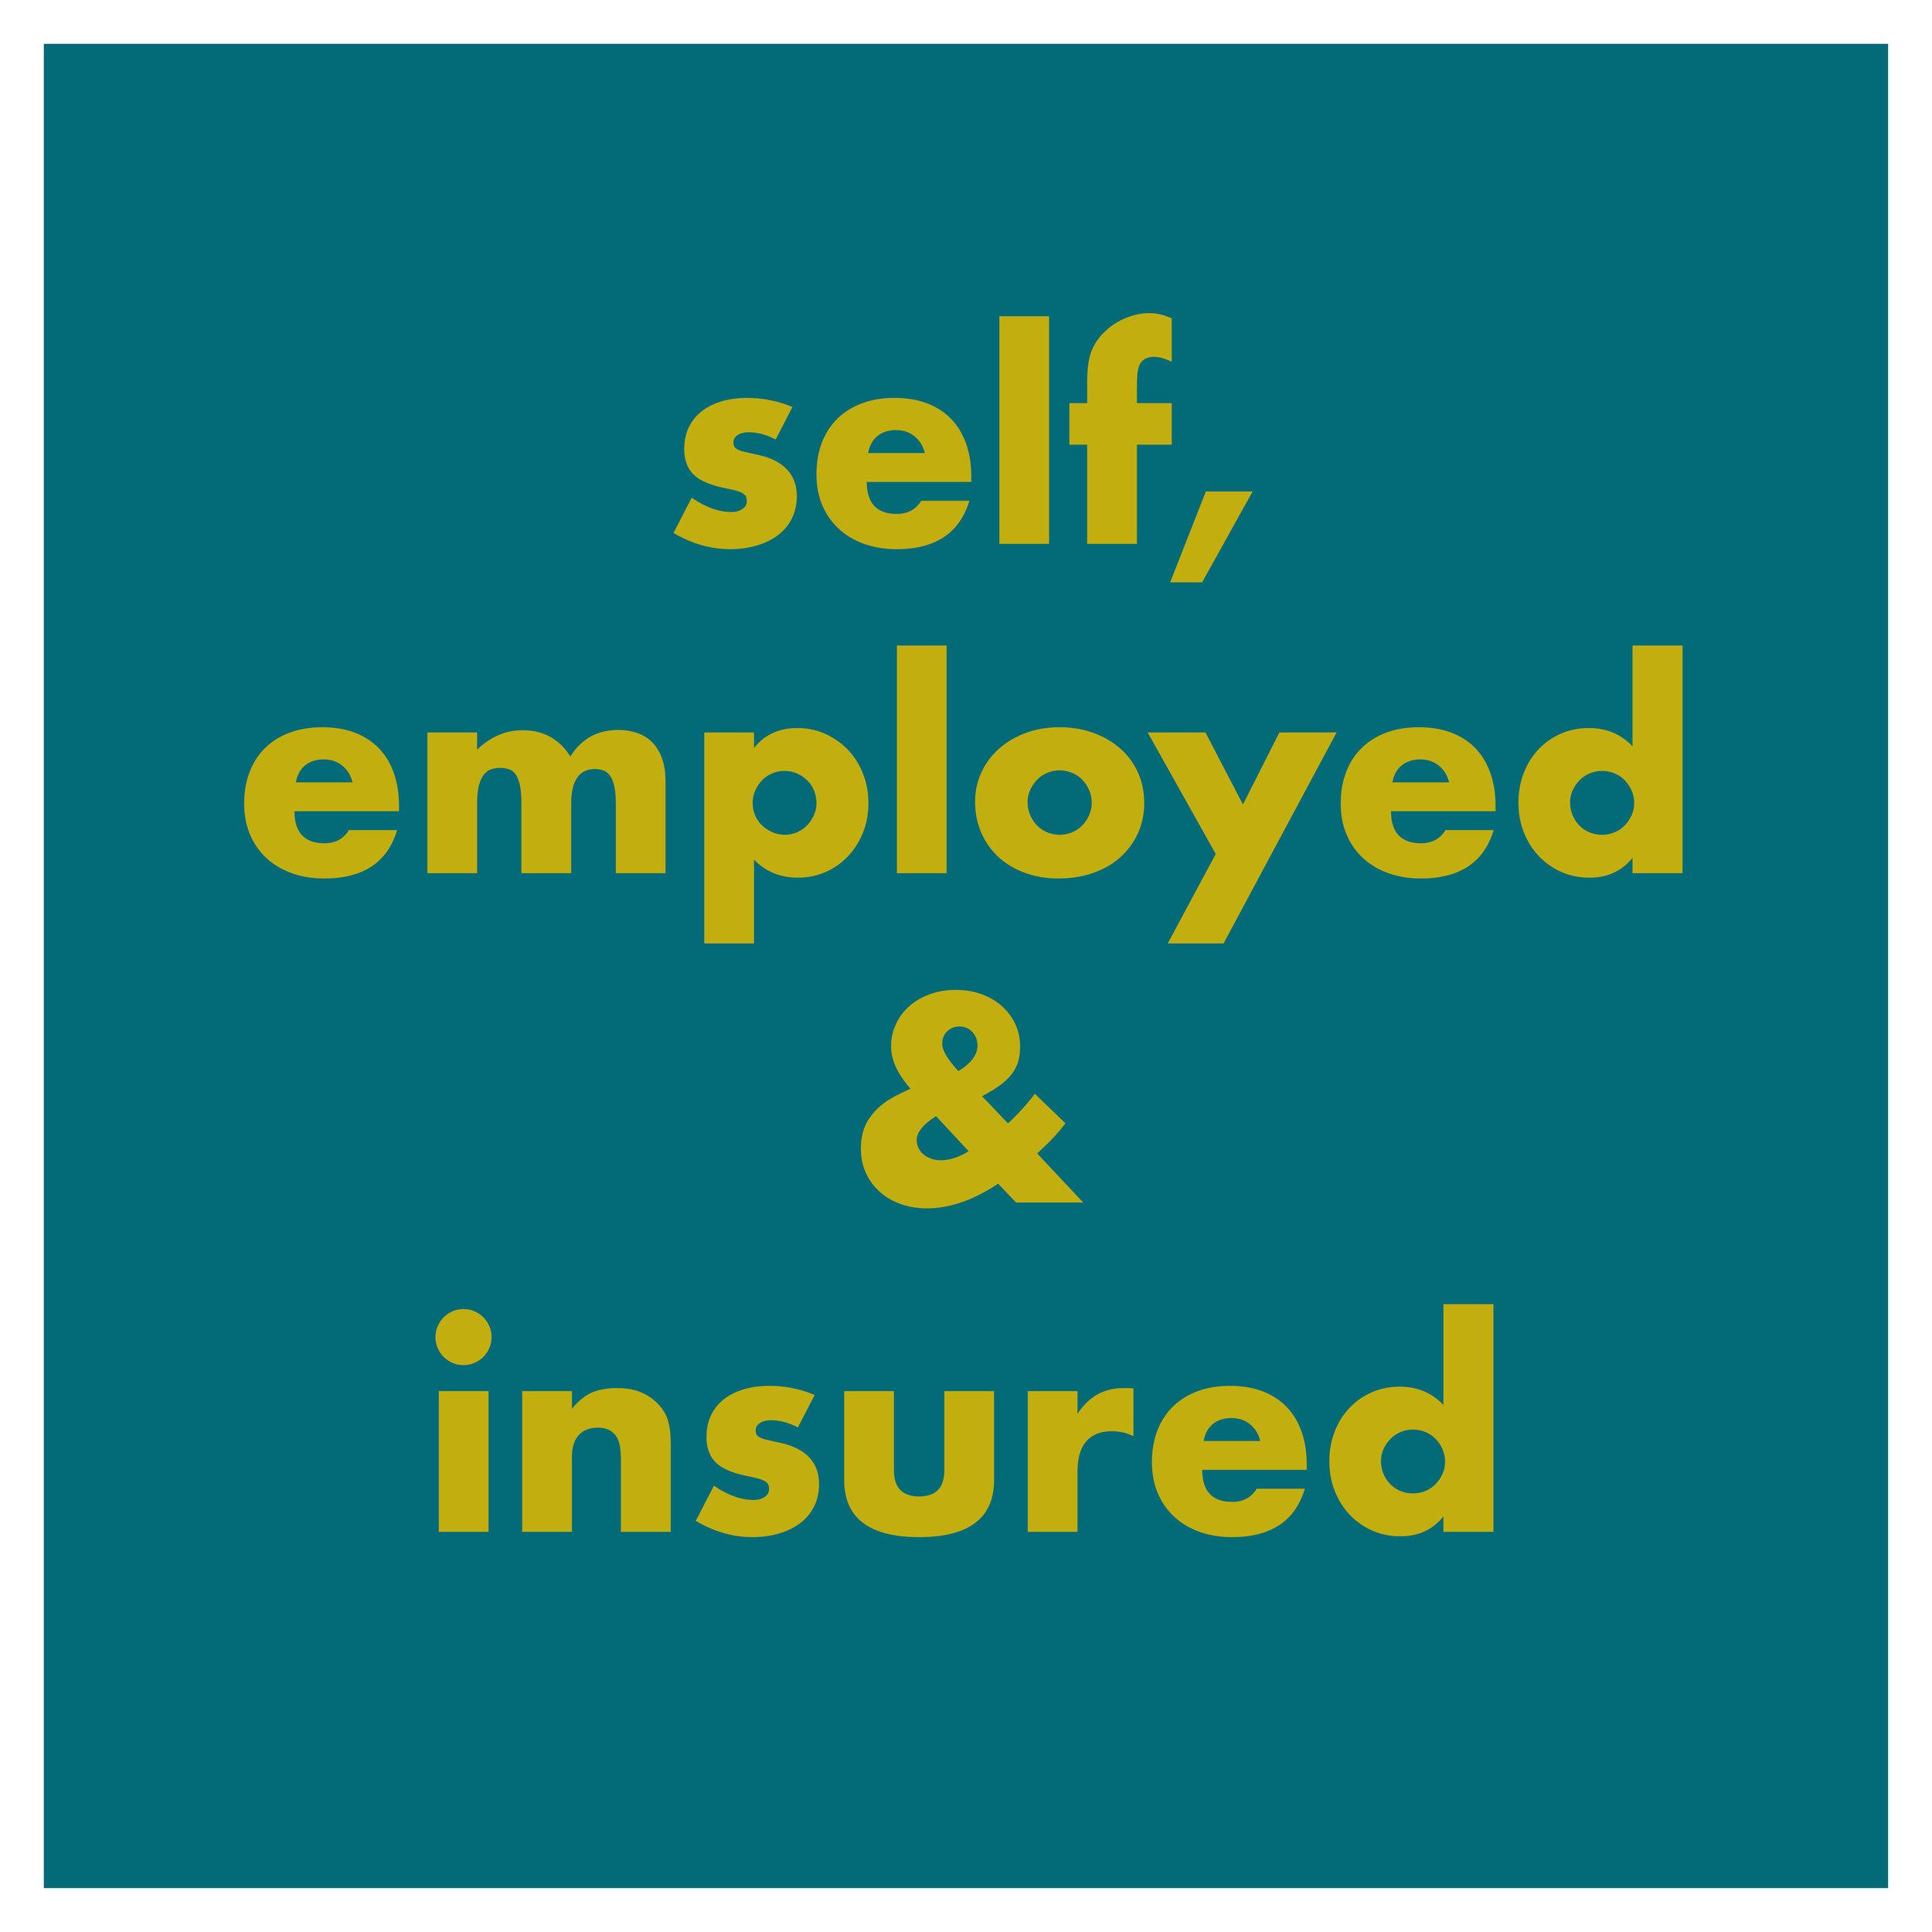 carre insured.jpg